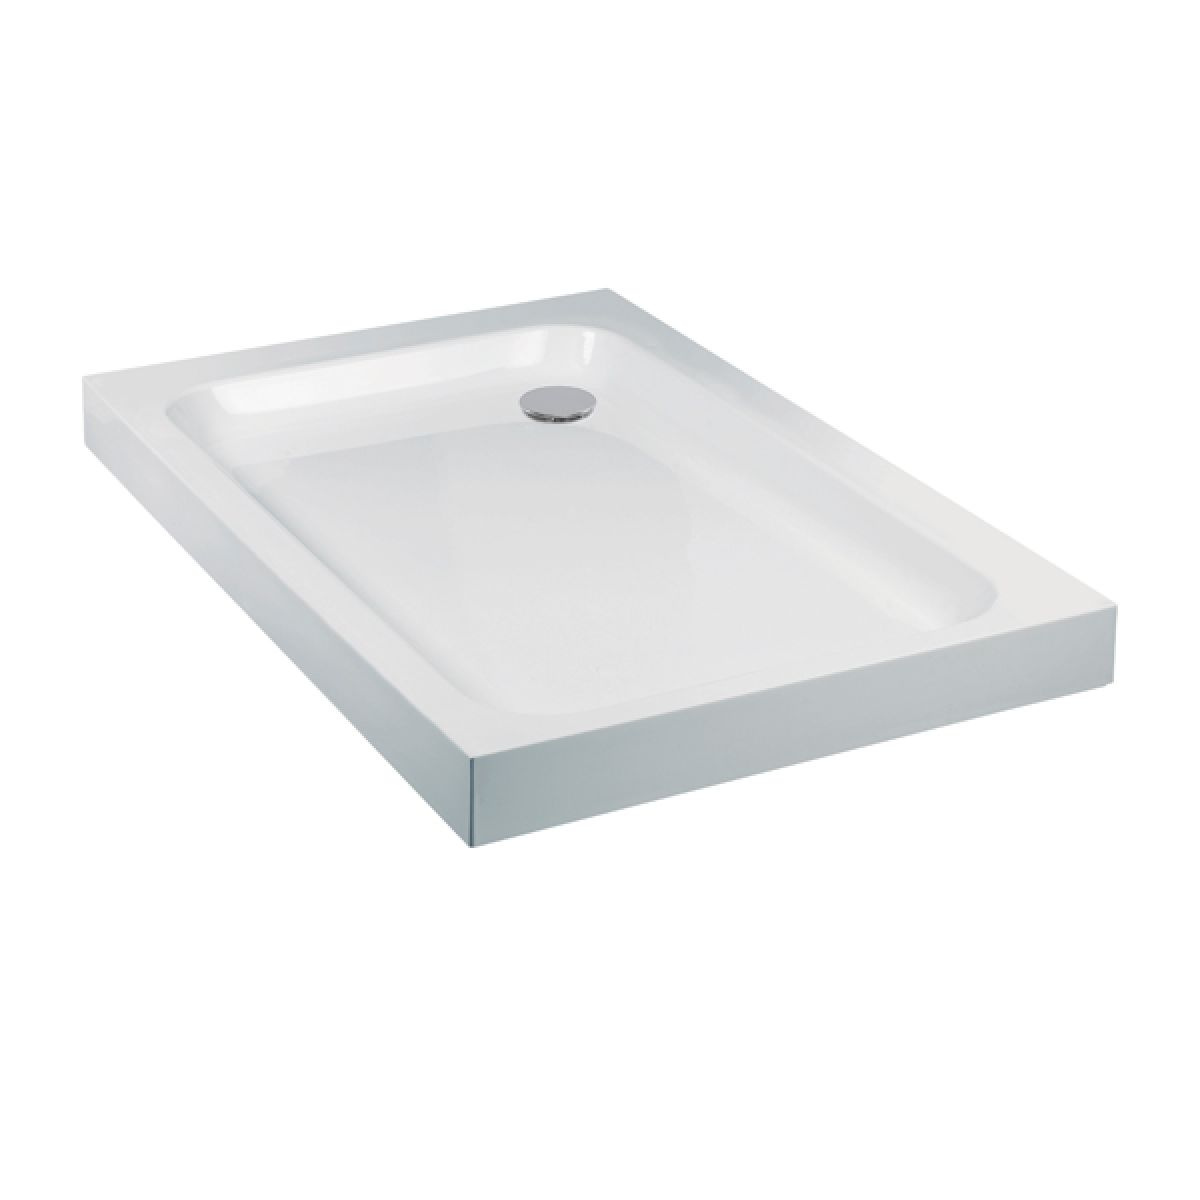 Frontline Standard Rectanglular Shower Tray 1200 x 800mm